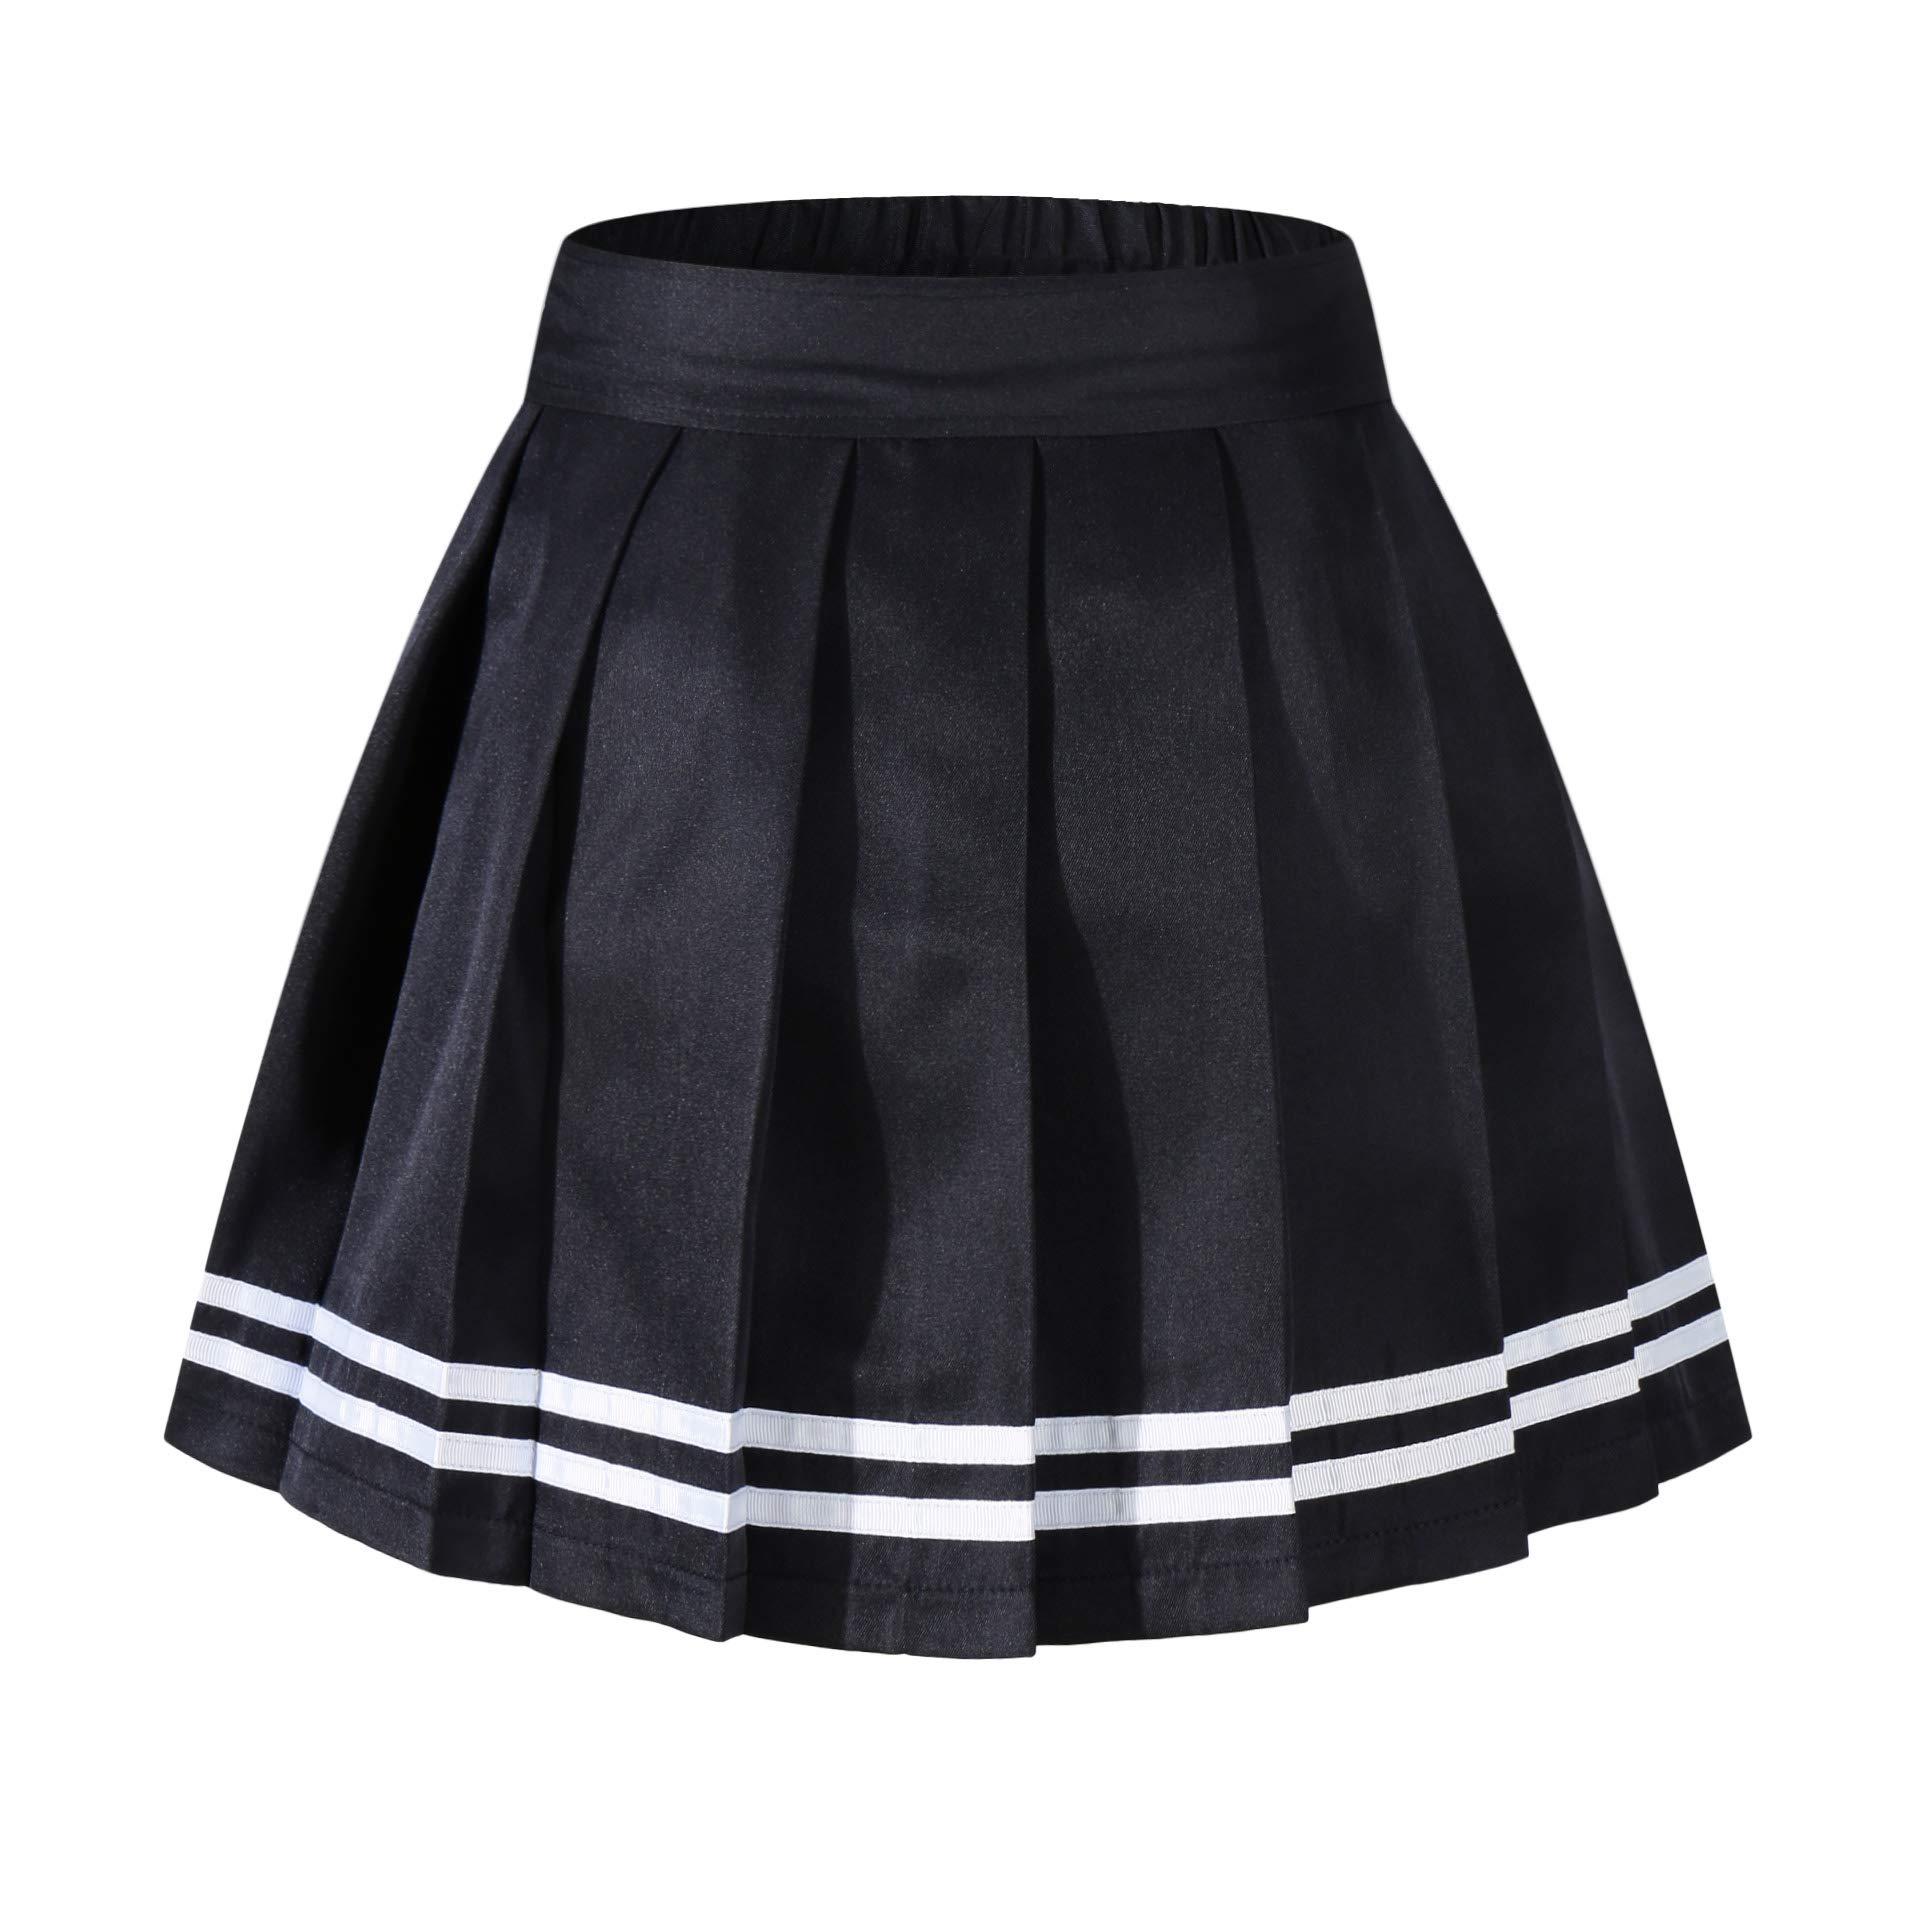 Beautifulfashionlife Girl's High Waisted Pleated Mid Skirt Tennis Shorts Black White Stripes,S